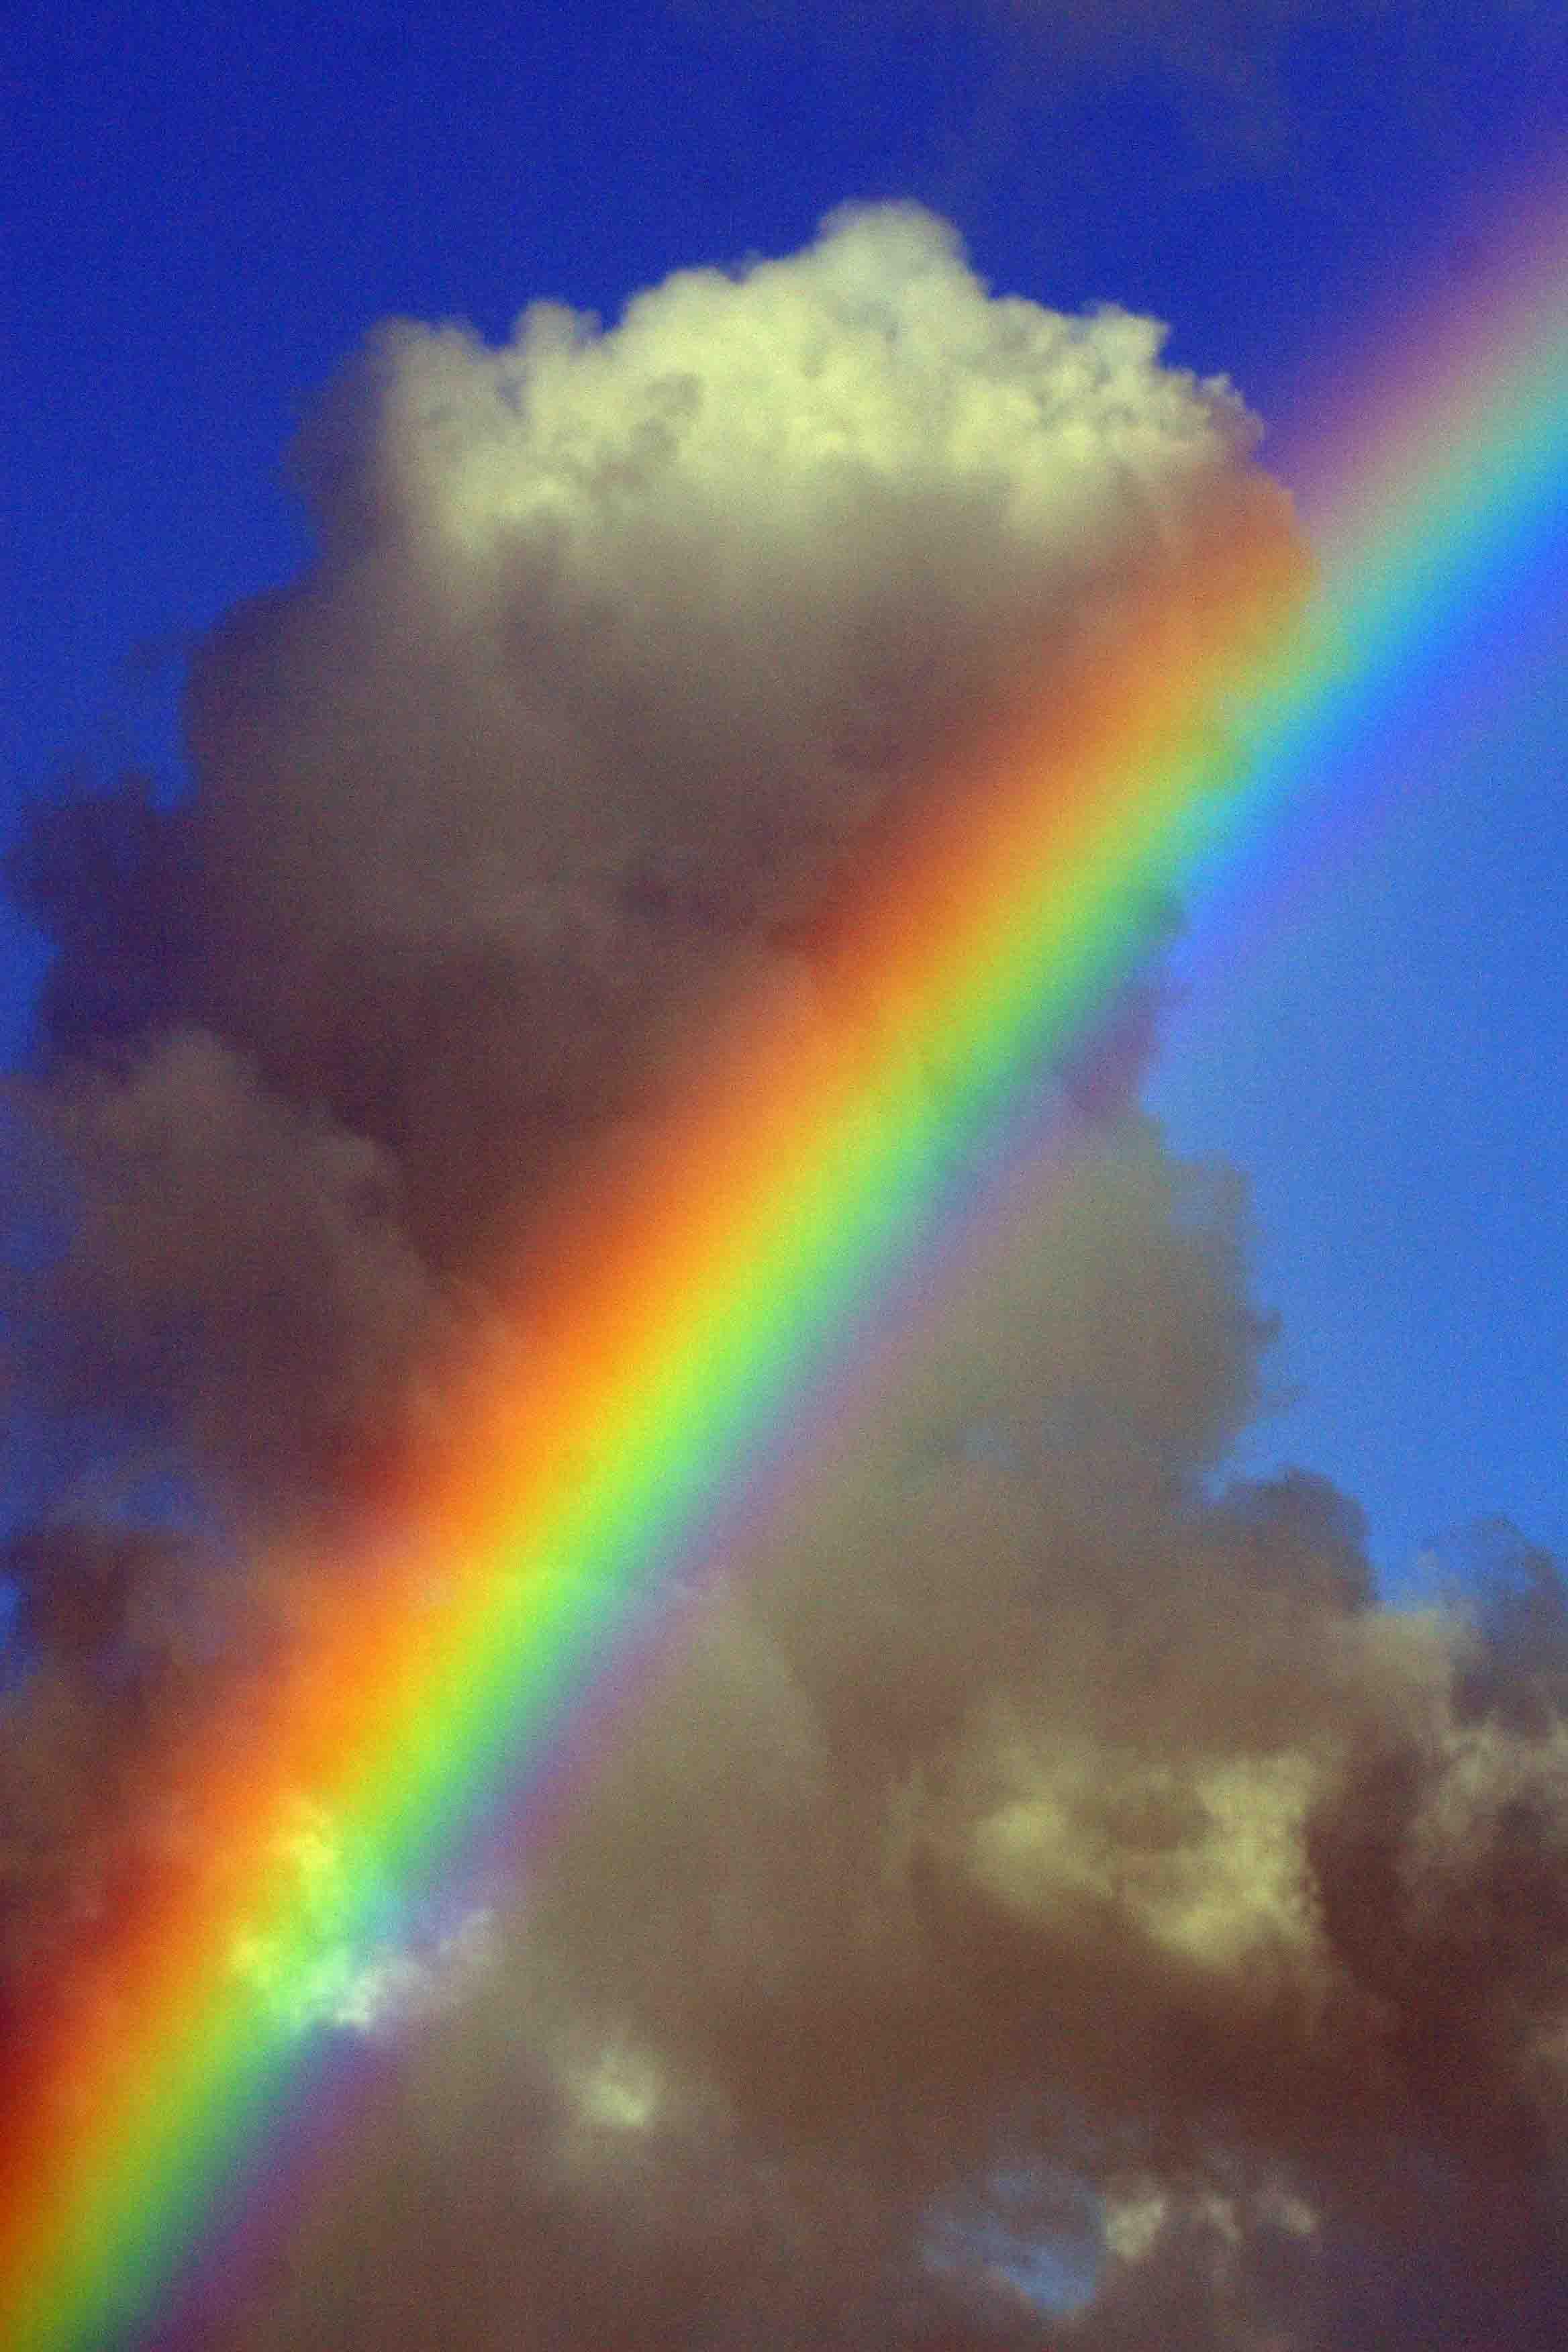 c33915d096f3aab15c71f10e8db1c110 Verwunderlich so where Over the Rainbow Dekorationen